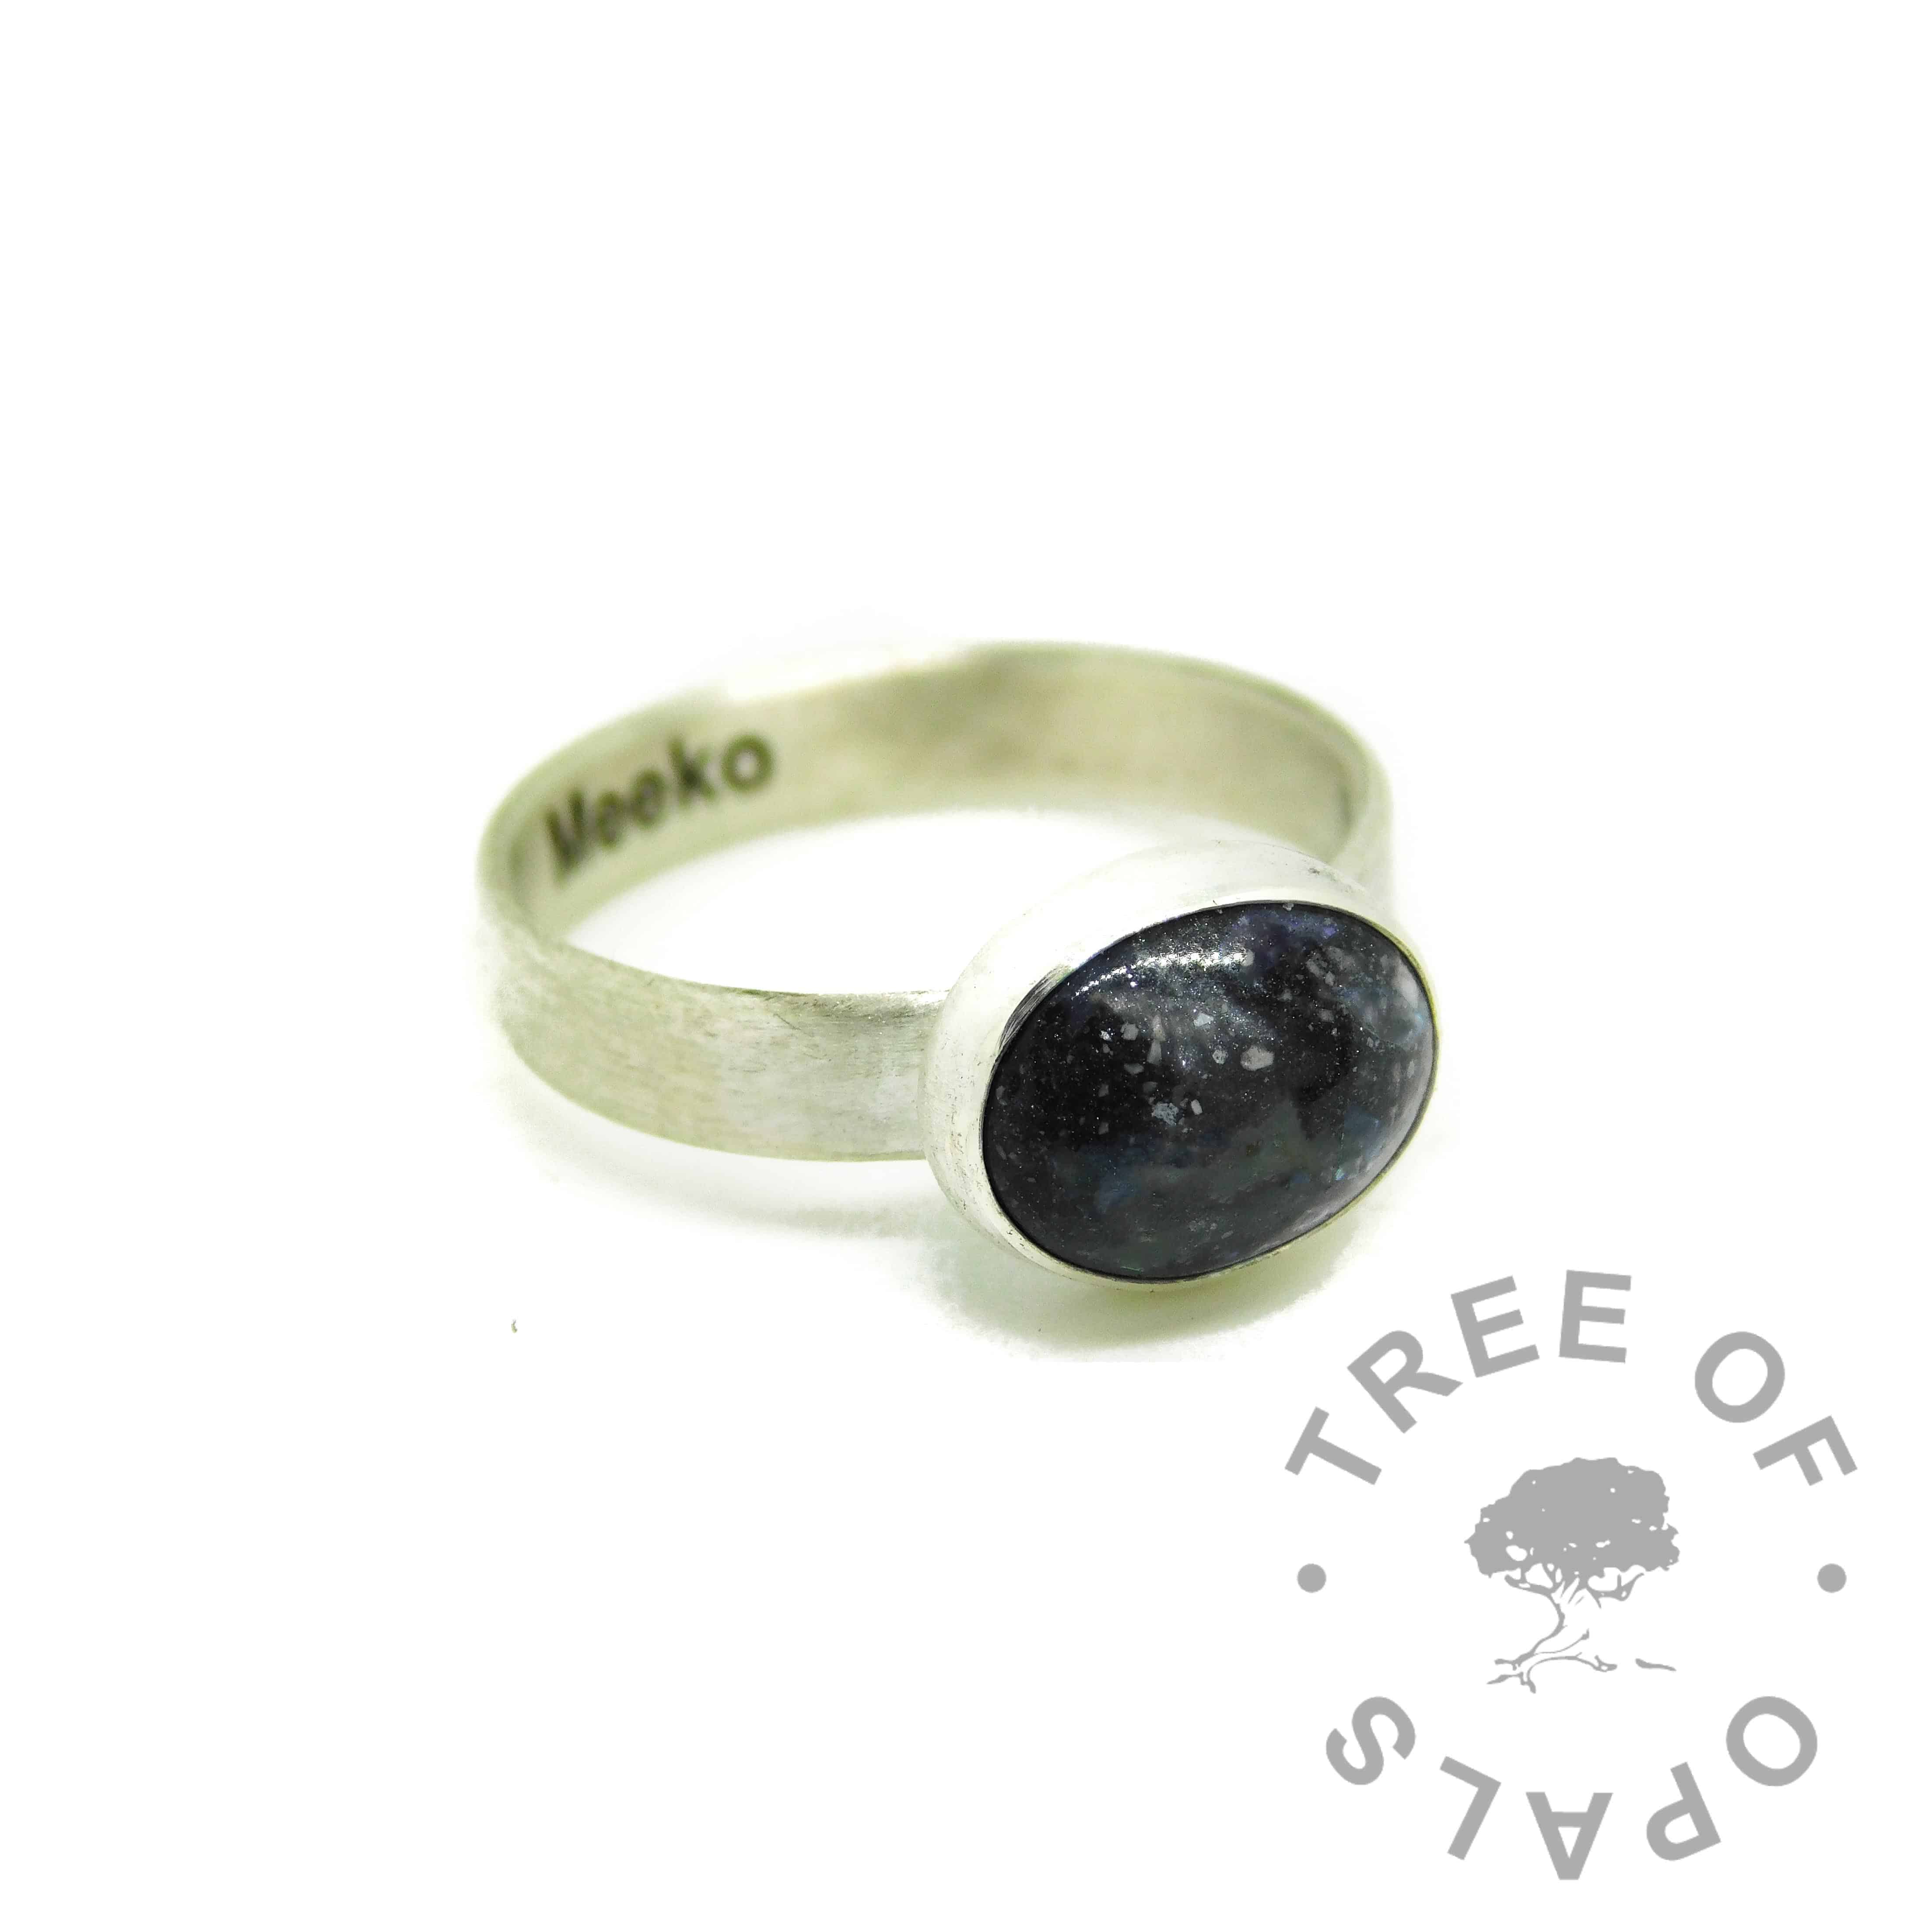 vampire black resin sparkle mix cremation ash ring, engraved brushed band